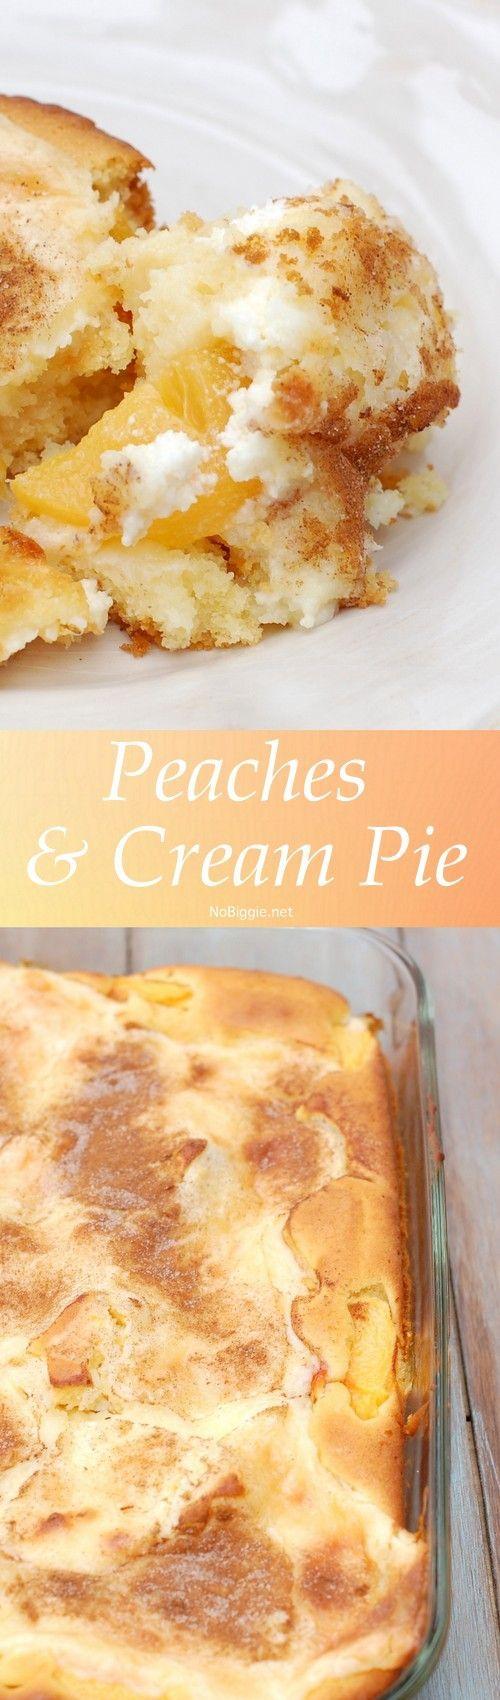 peaches and cream pie | http://NoBiggie.net